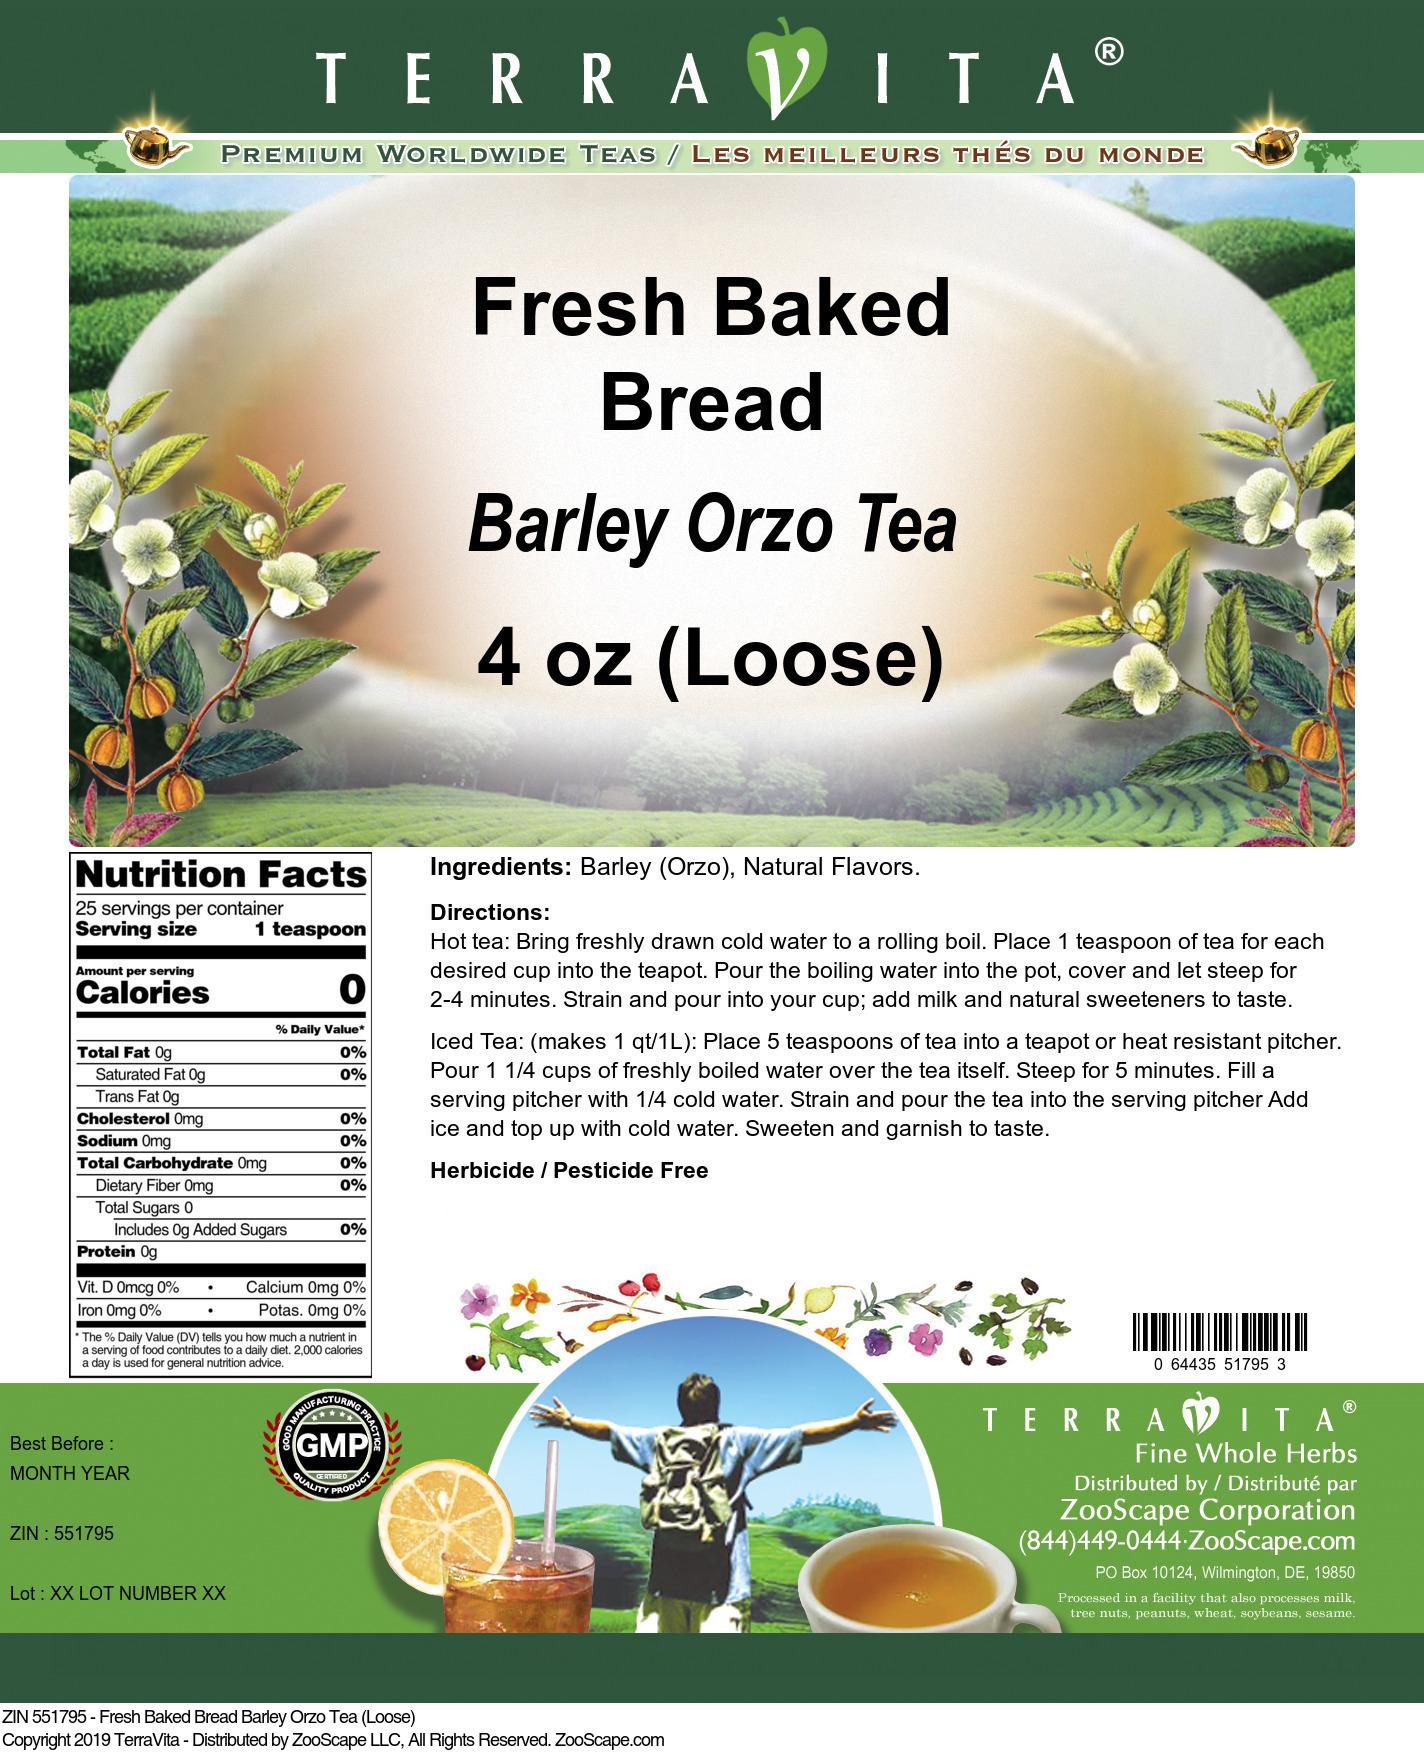 Fresh Baked Bread Barley Orzo